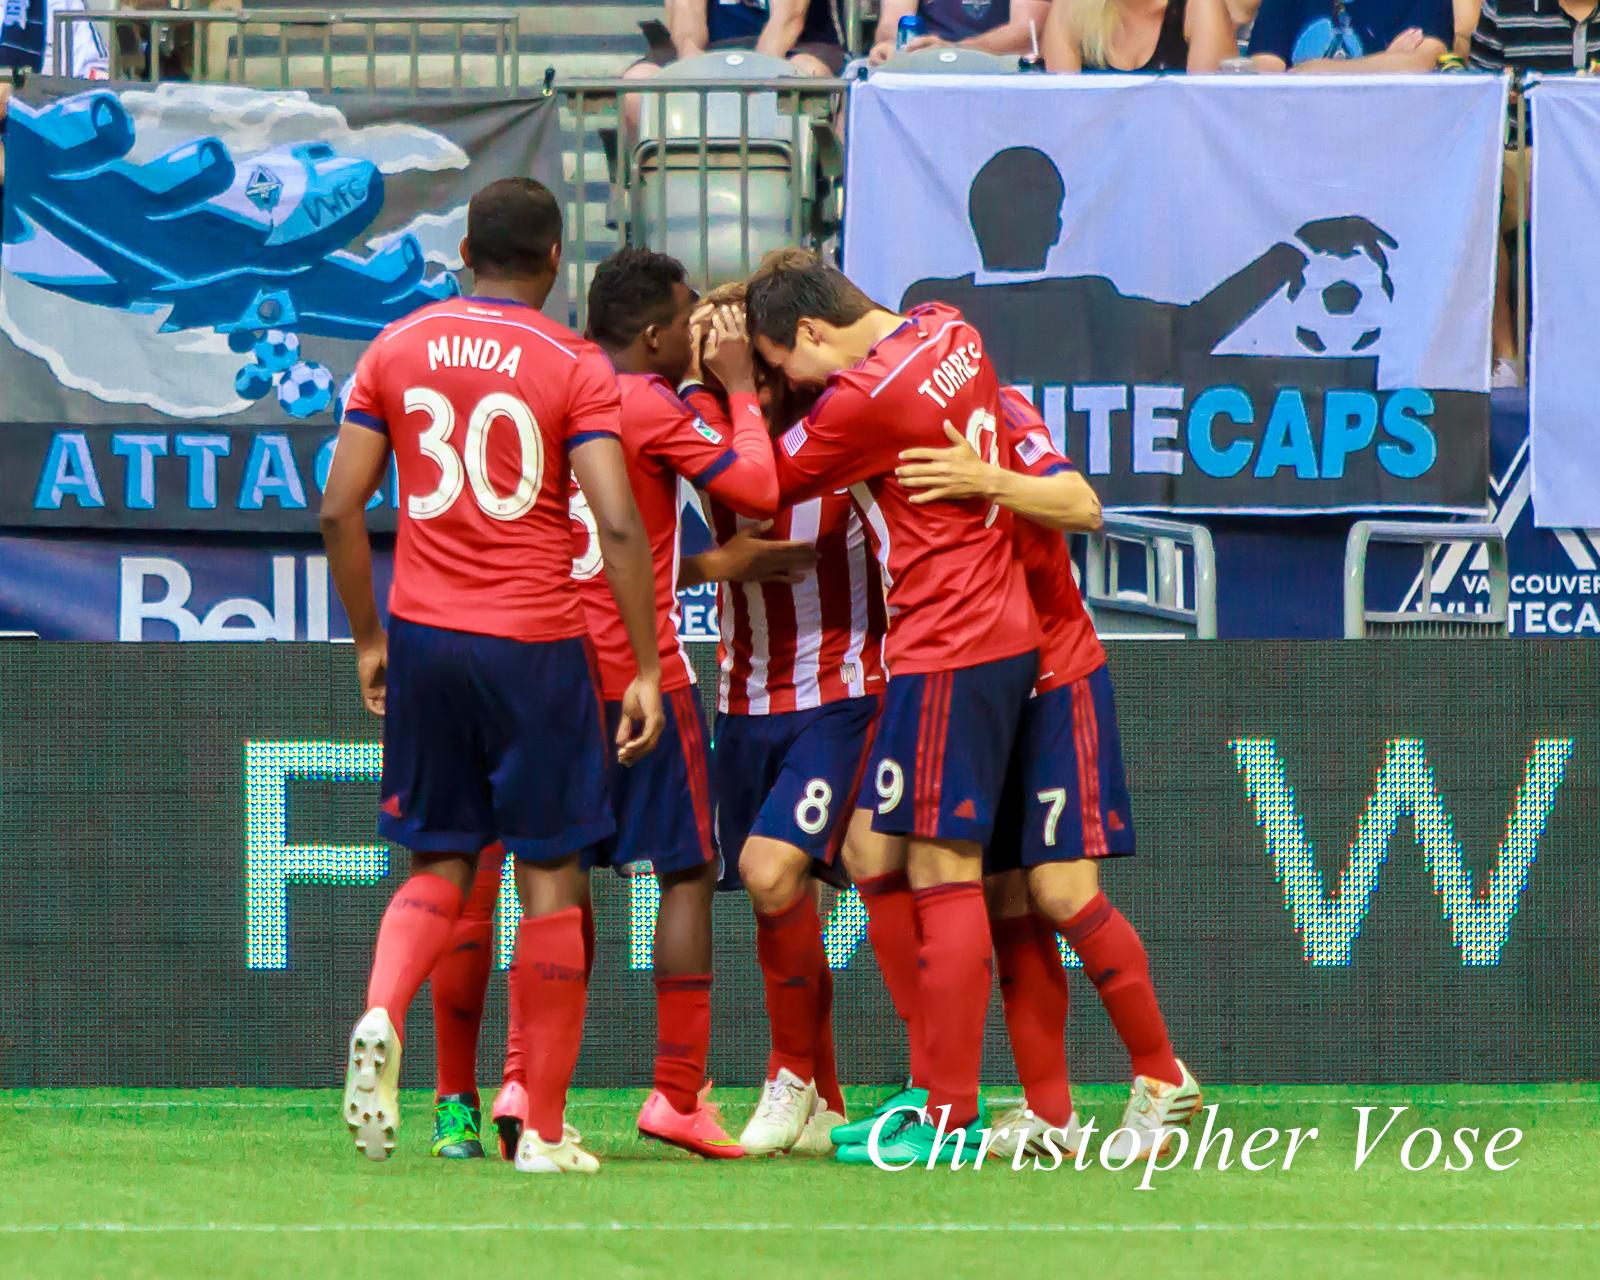 2014-07-12 Agustín Pelletieri Goal Celebration.jpg